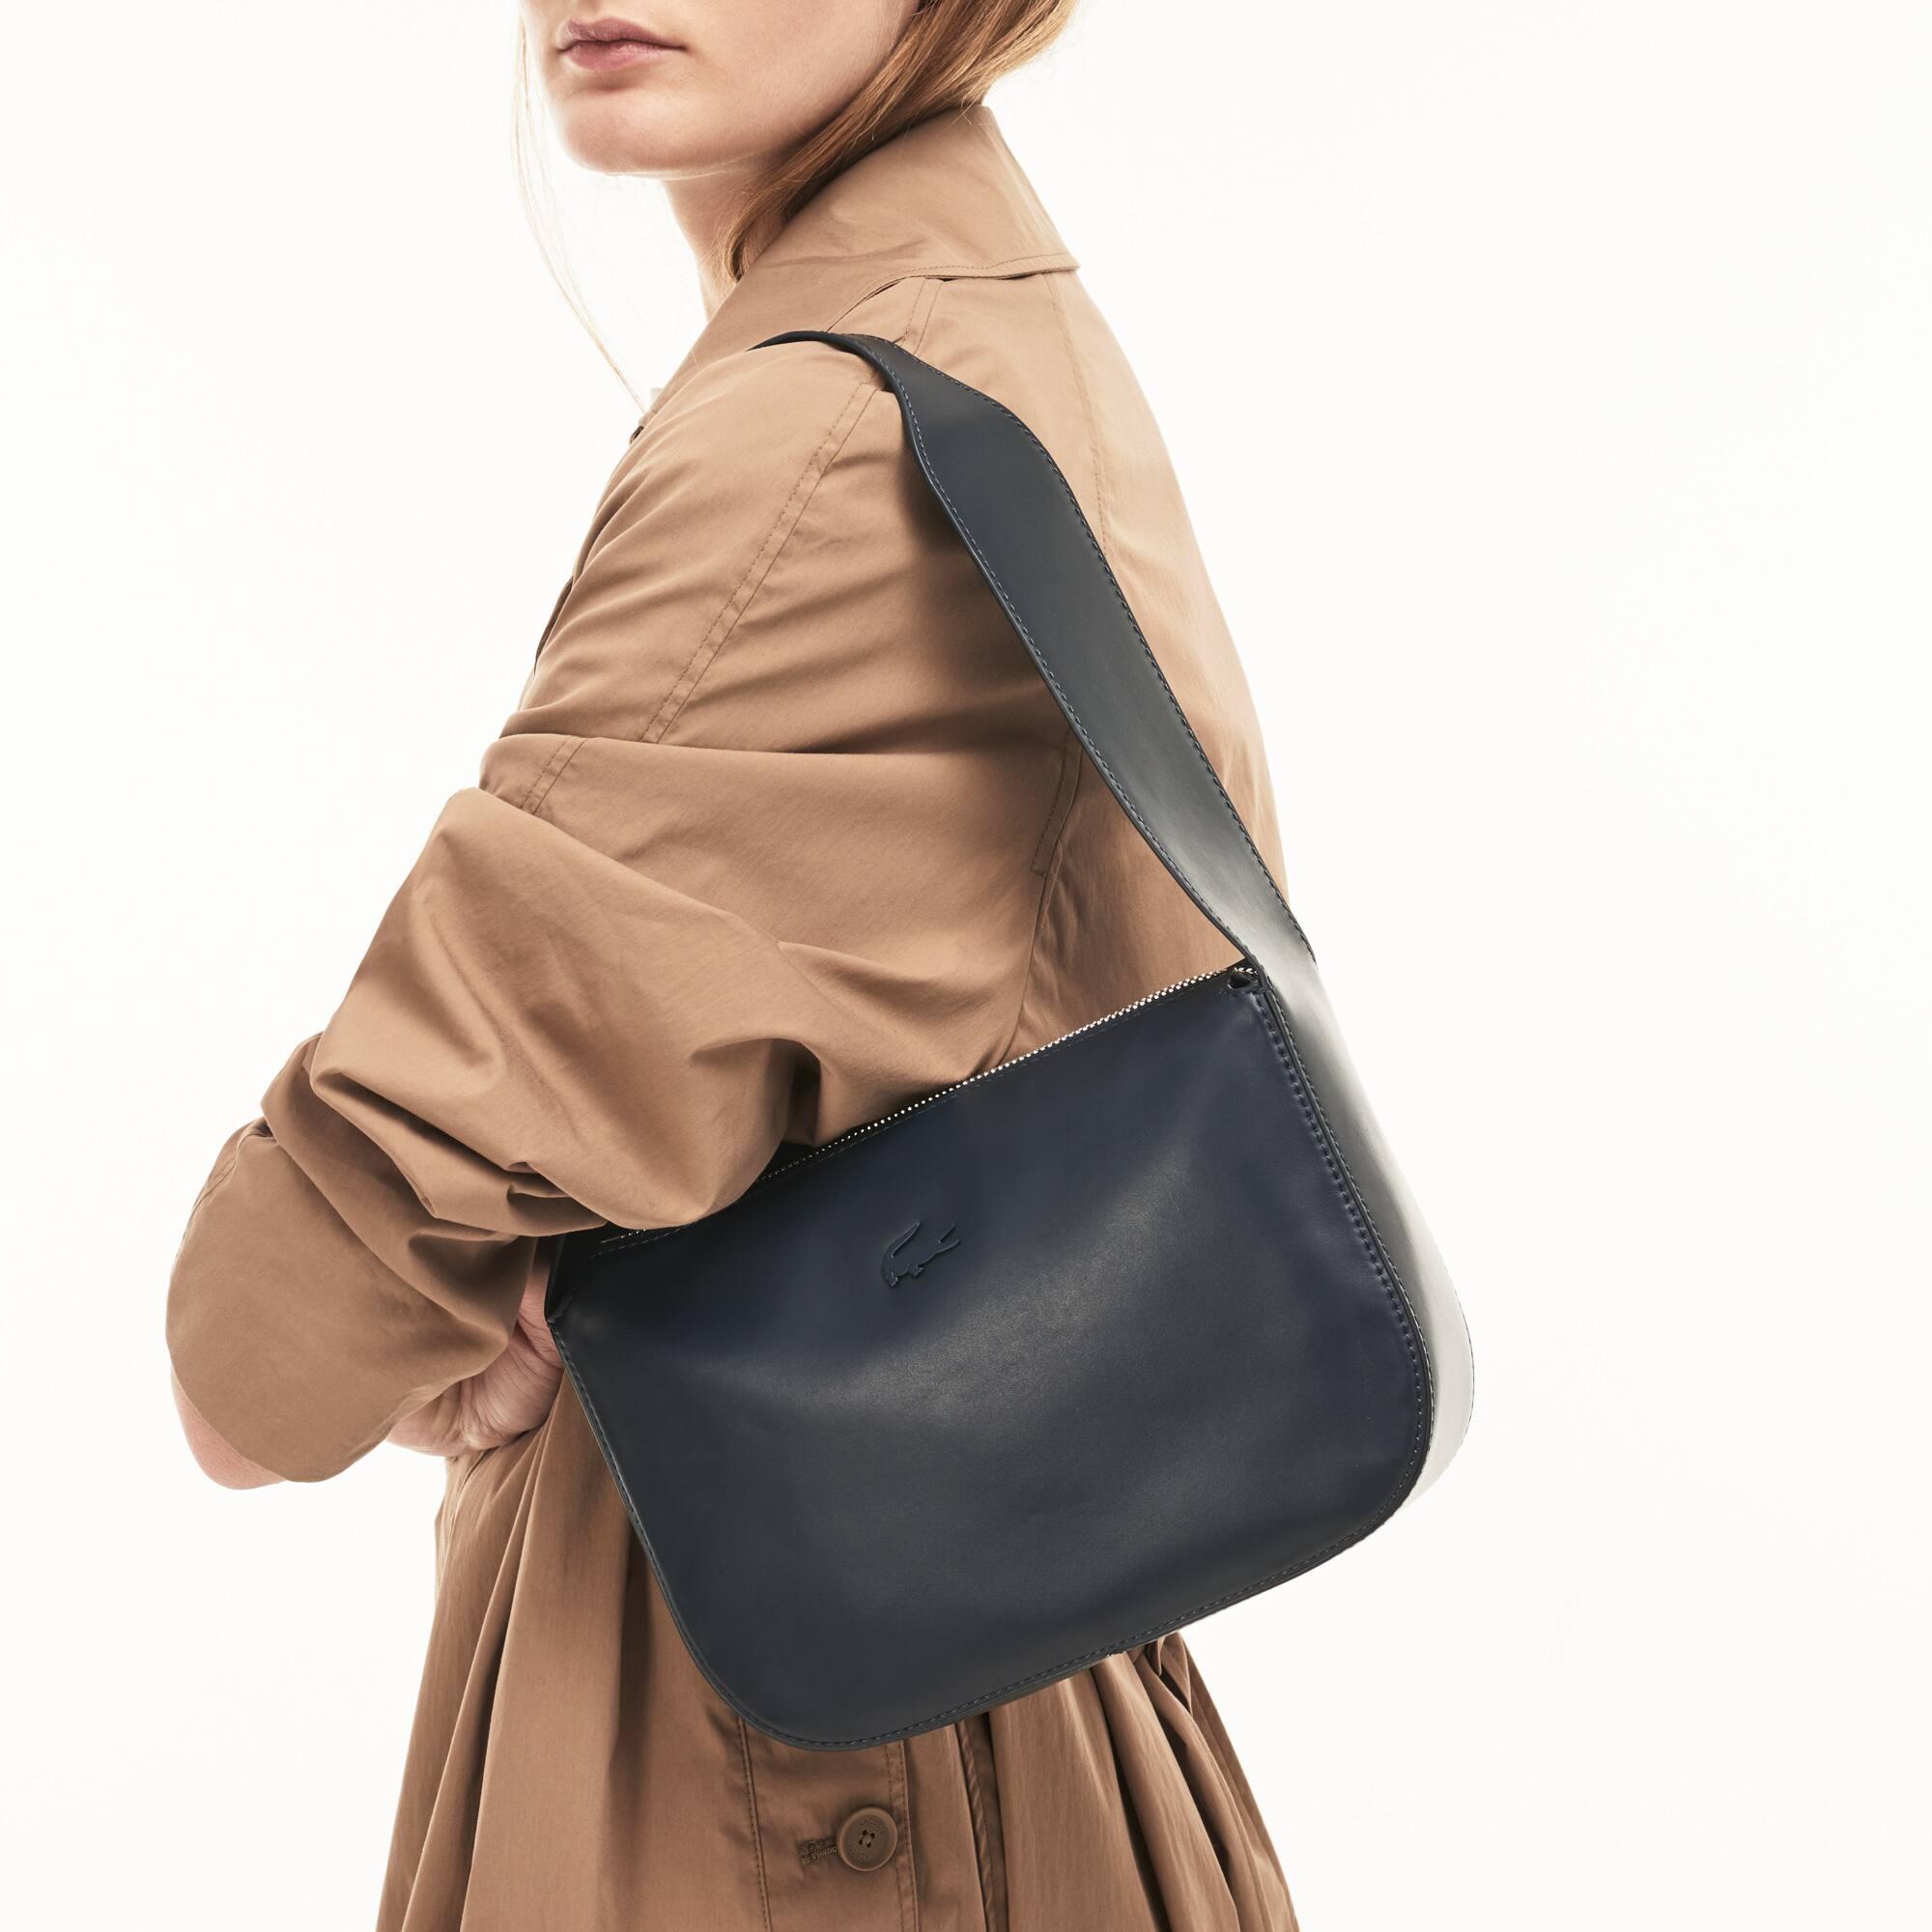 Women's Purity Soft Monochrome Leather Mini Hobo Bag